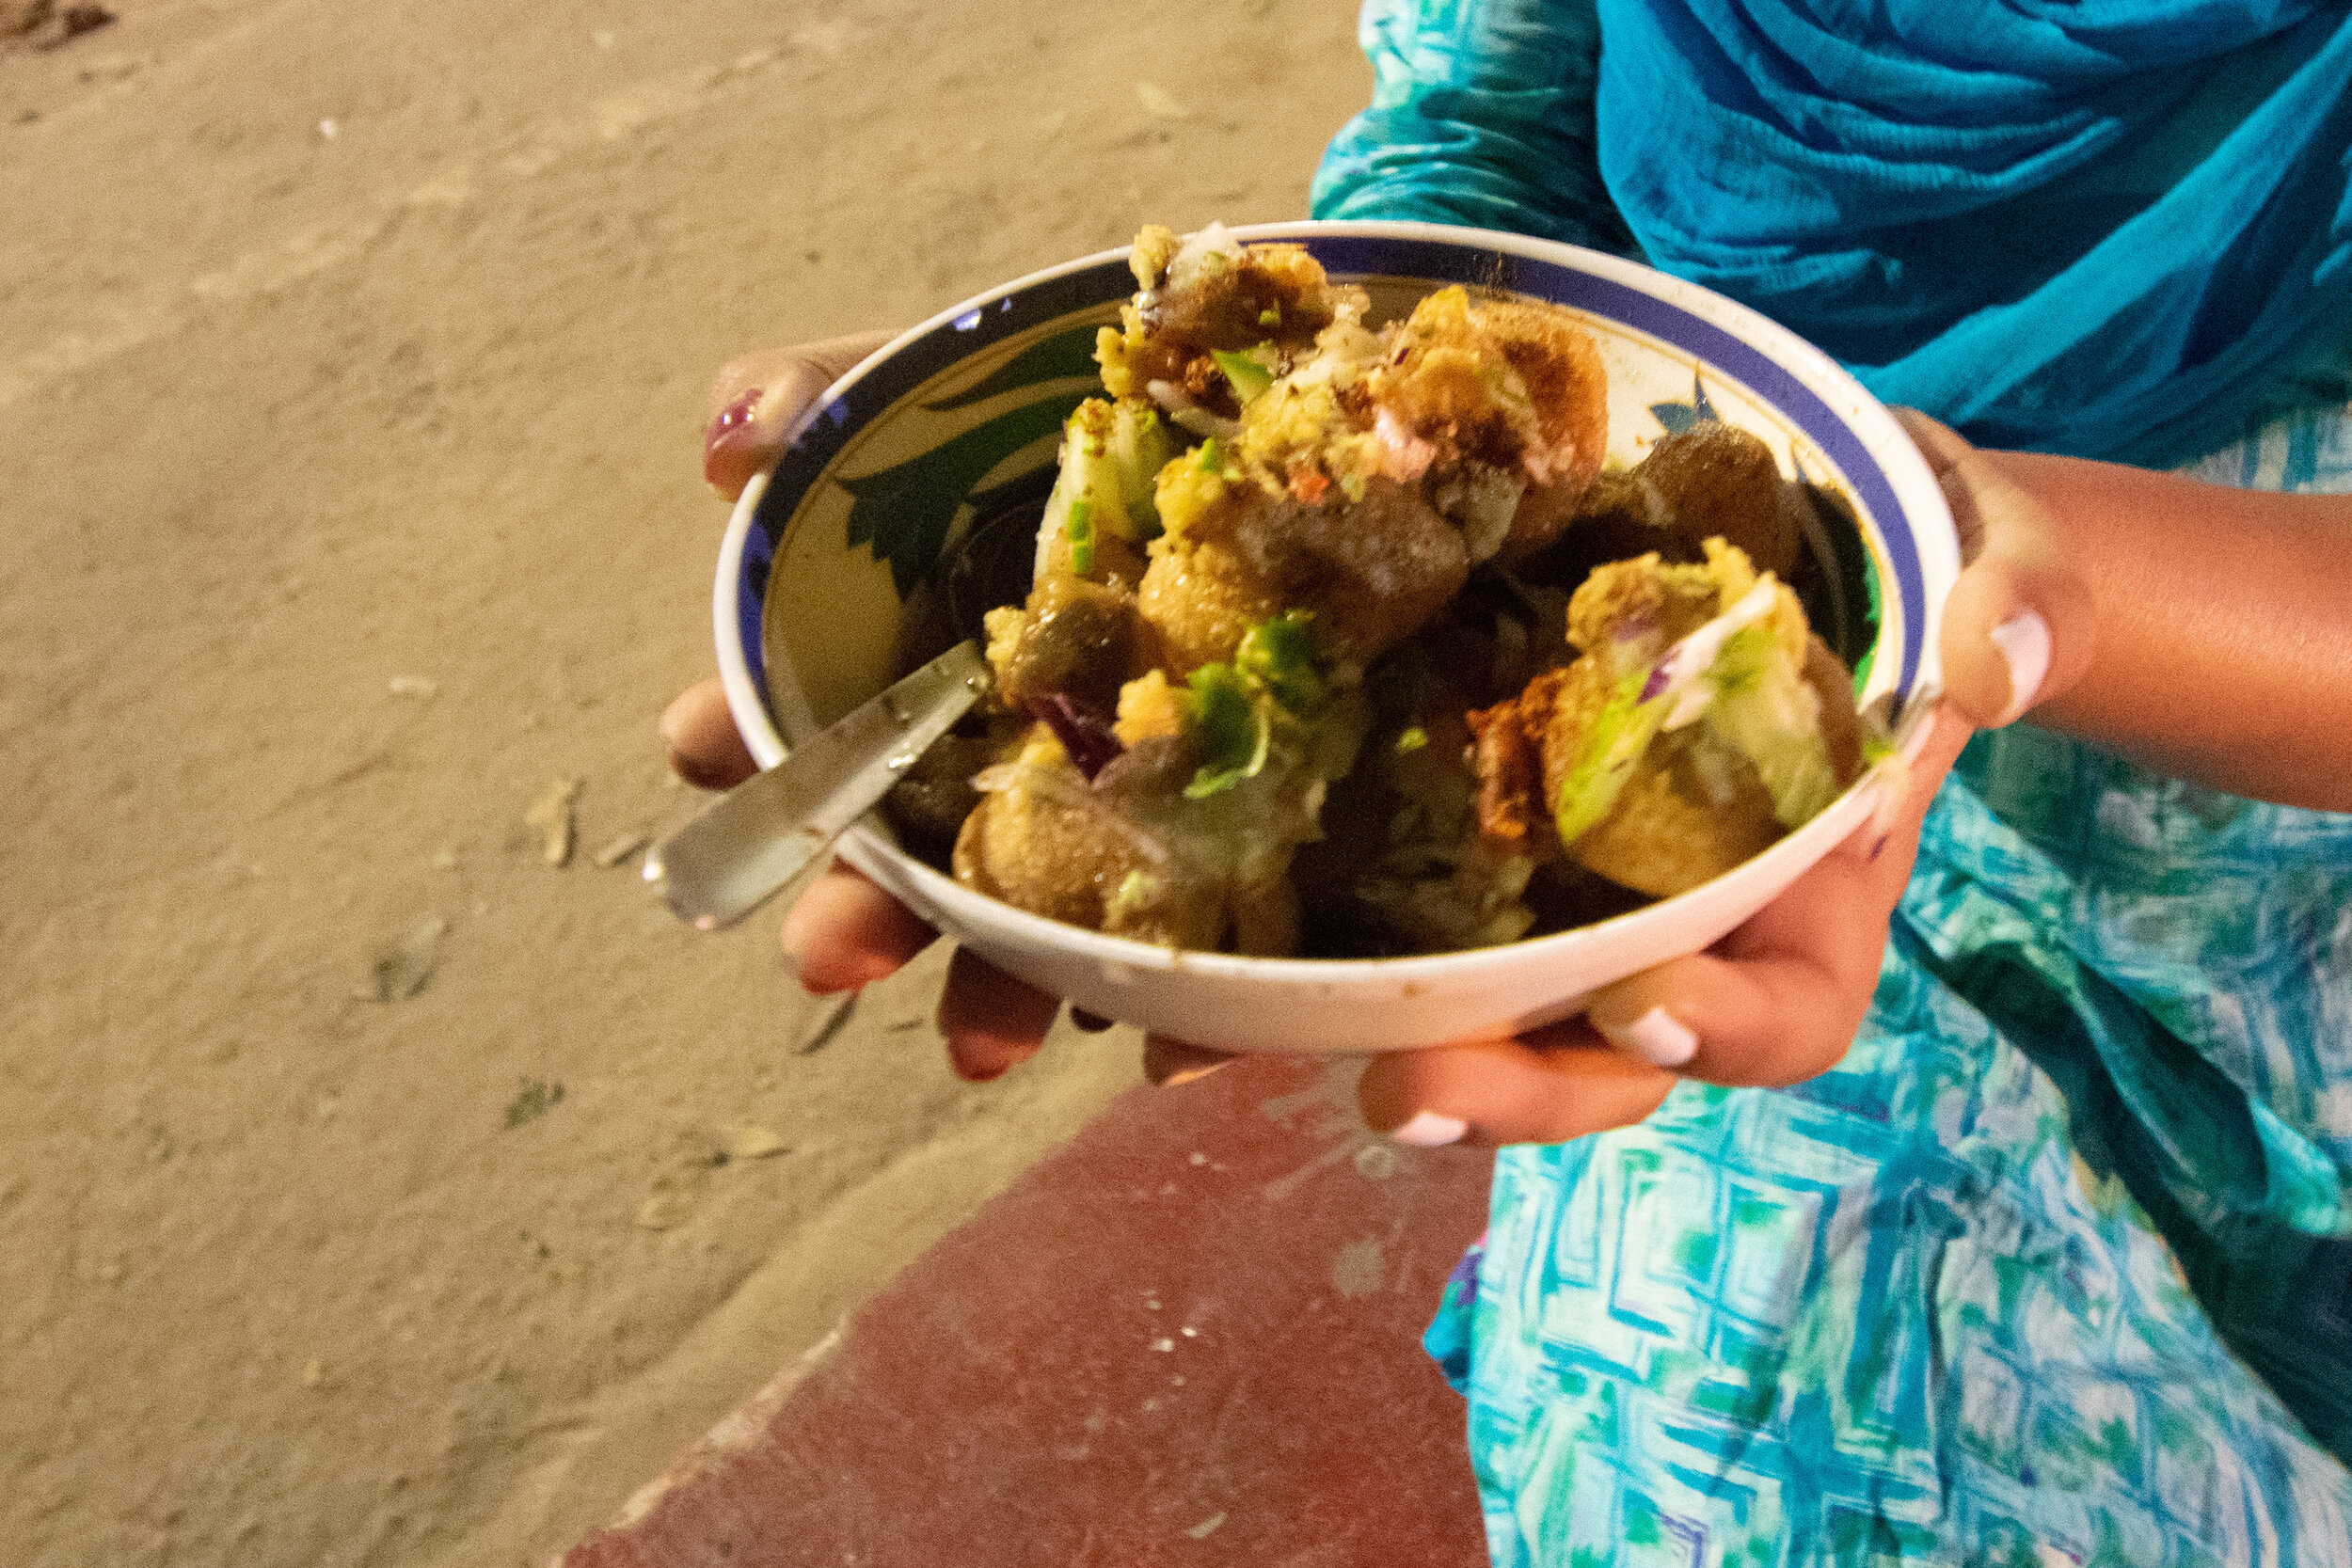 The #1 street food in Dhaka, a bowl of Fucka.